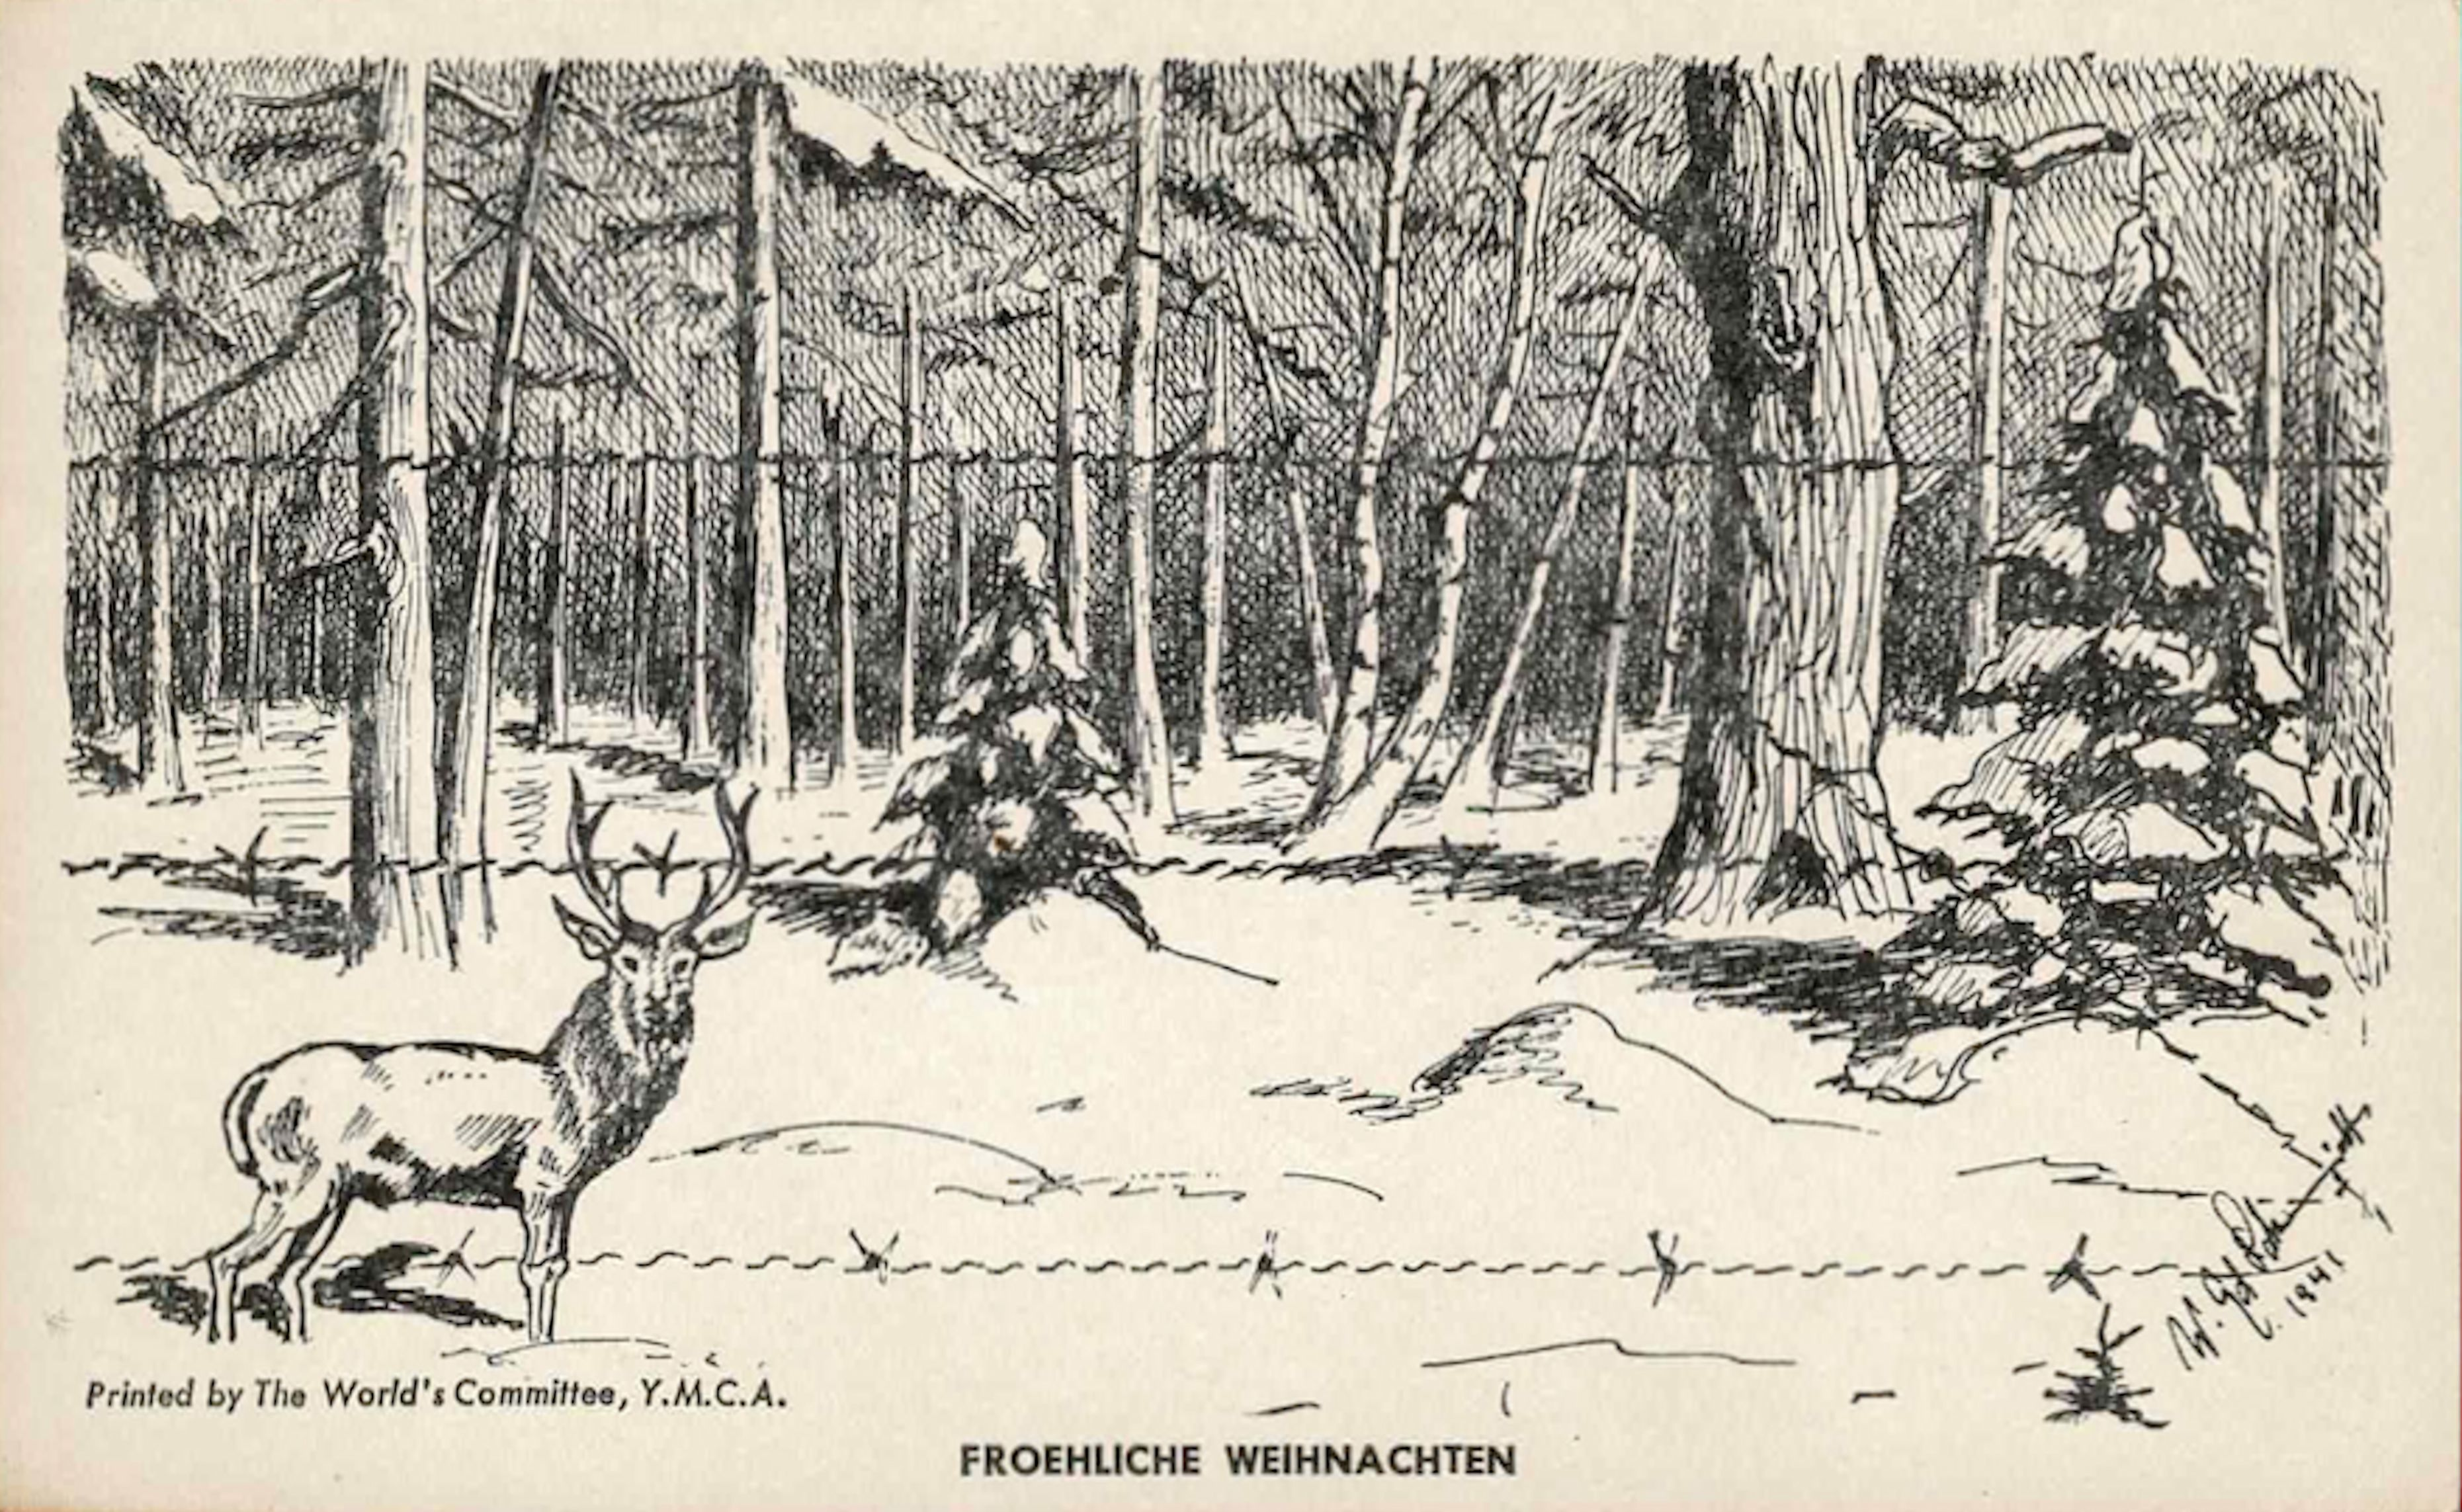 1941;Canada;The World's Committee, YMCA ; WW II-Era Christmas POW Card